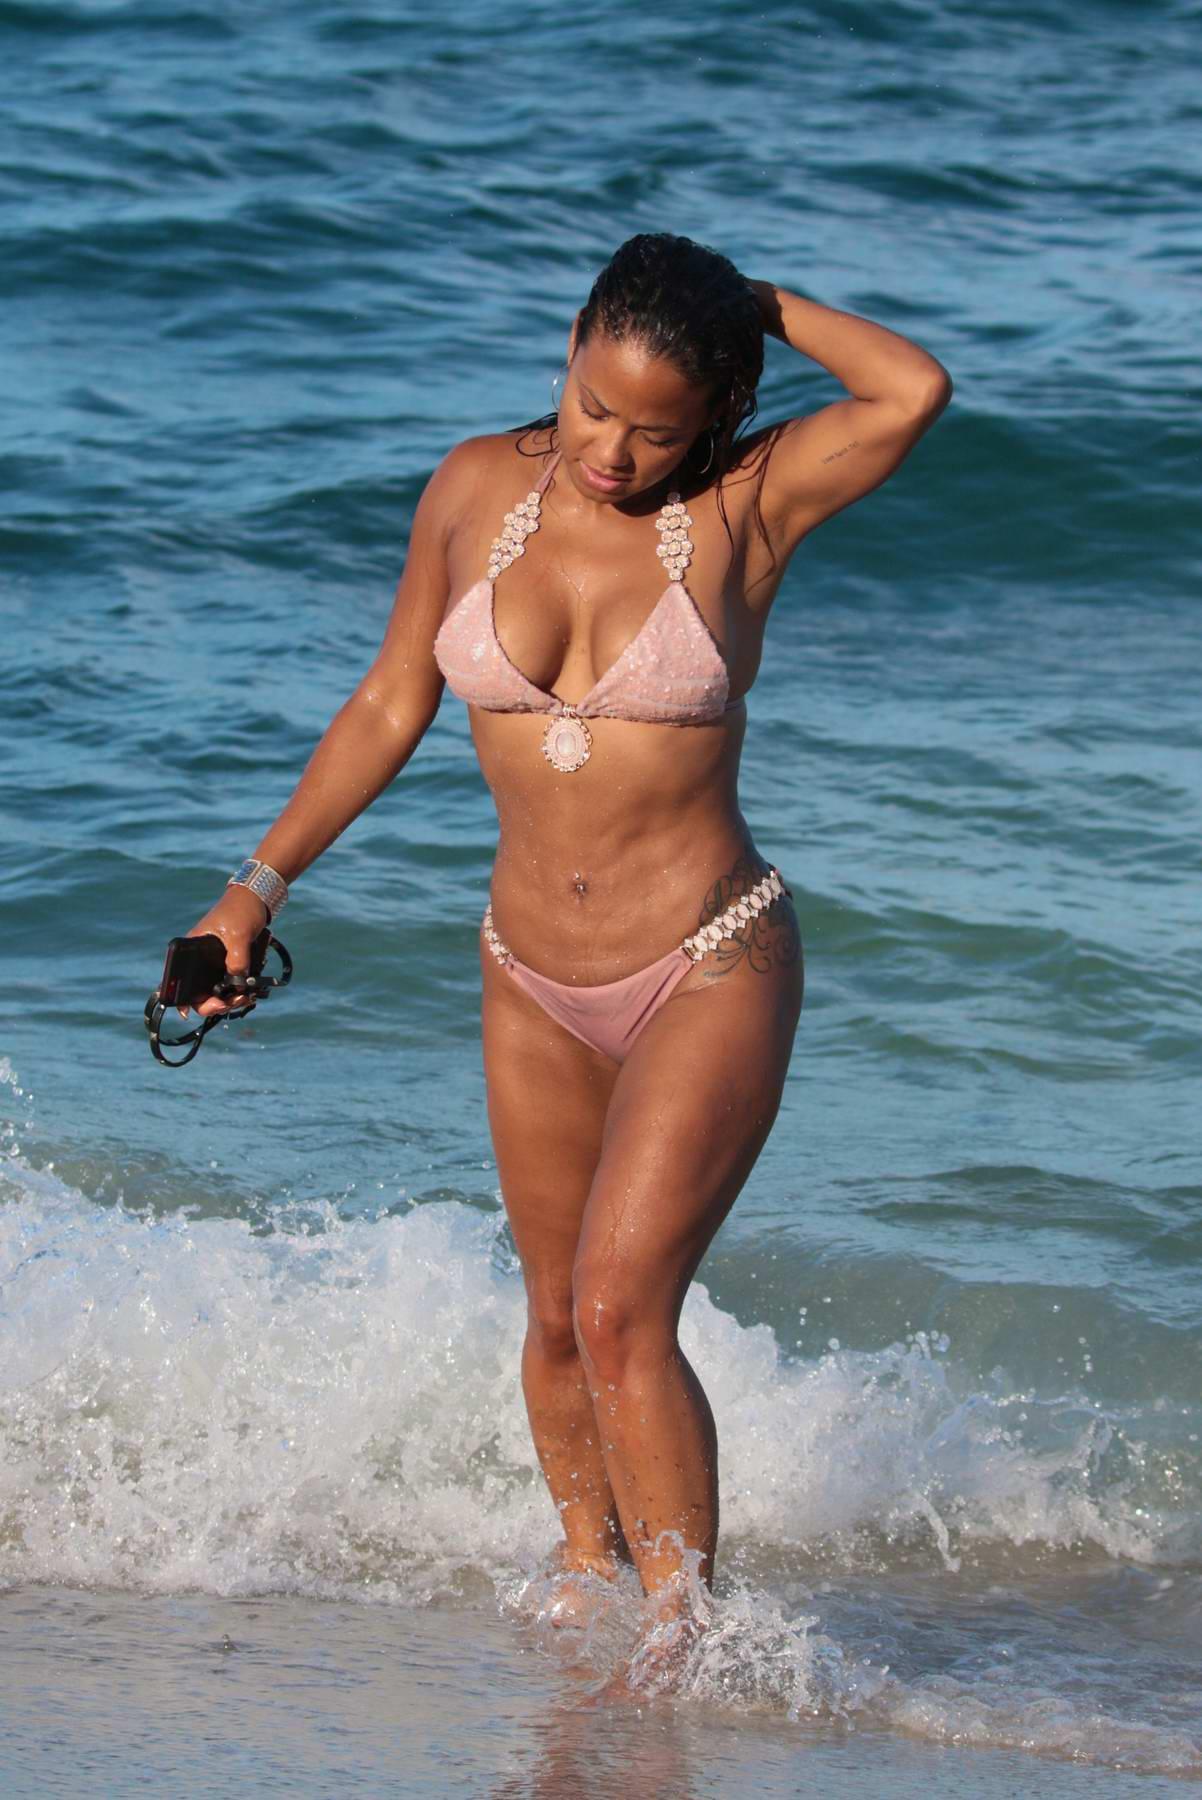 Christina Milian hits the Beach in a Bikini in Miami